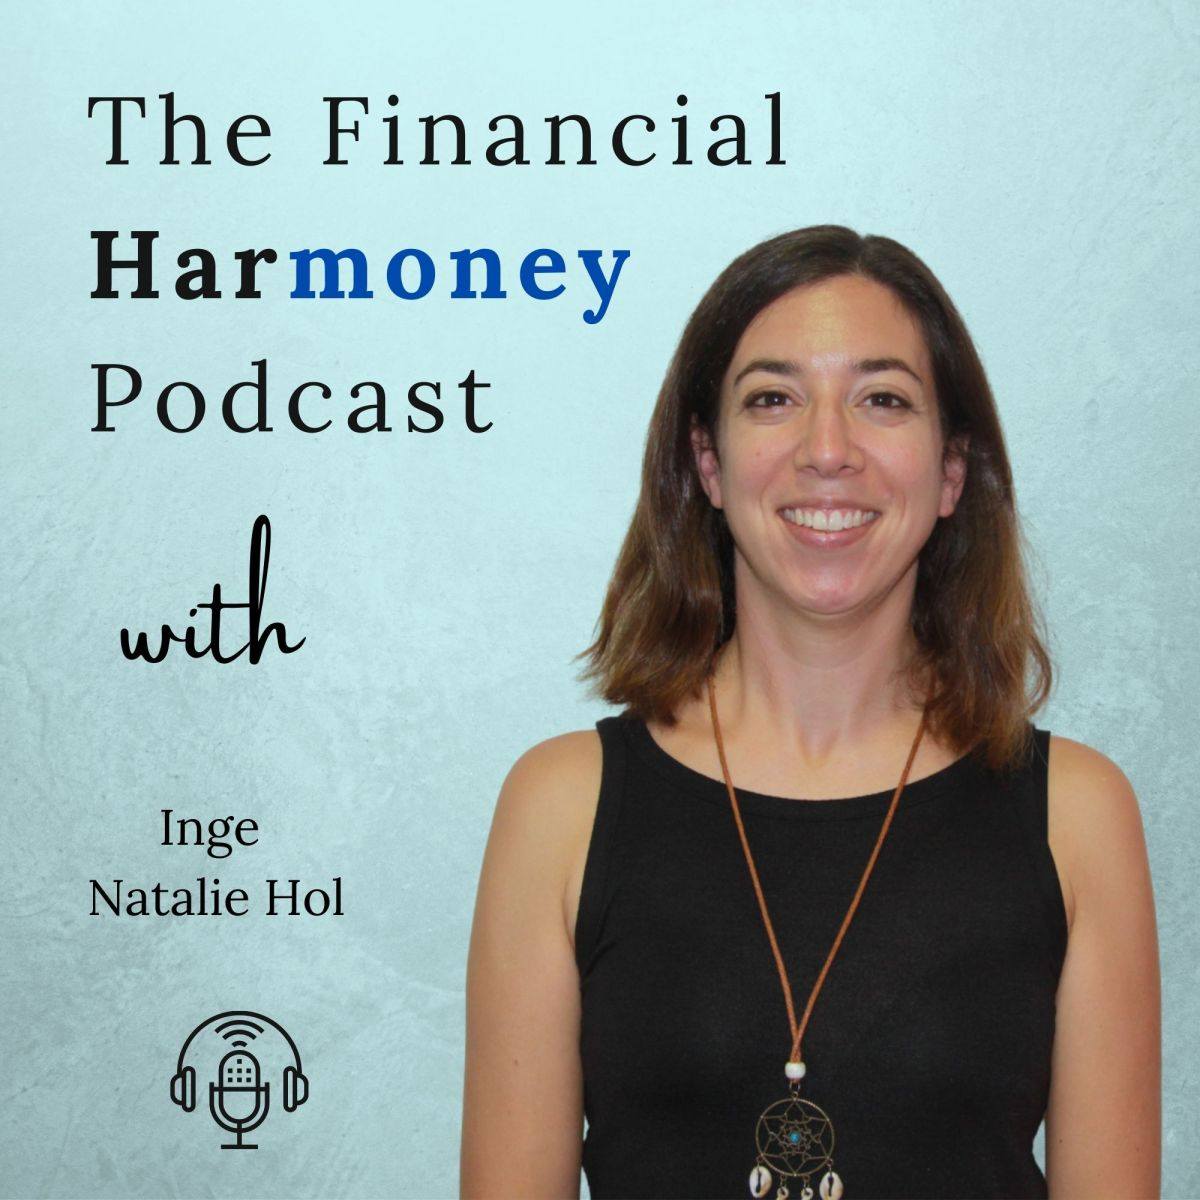 The Financial Harmoney Podcast